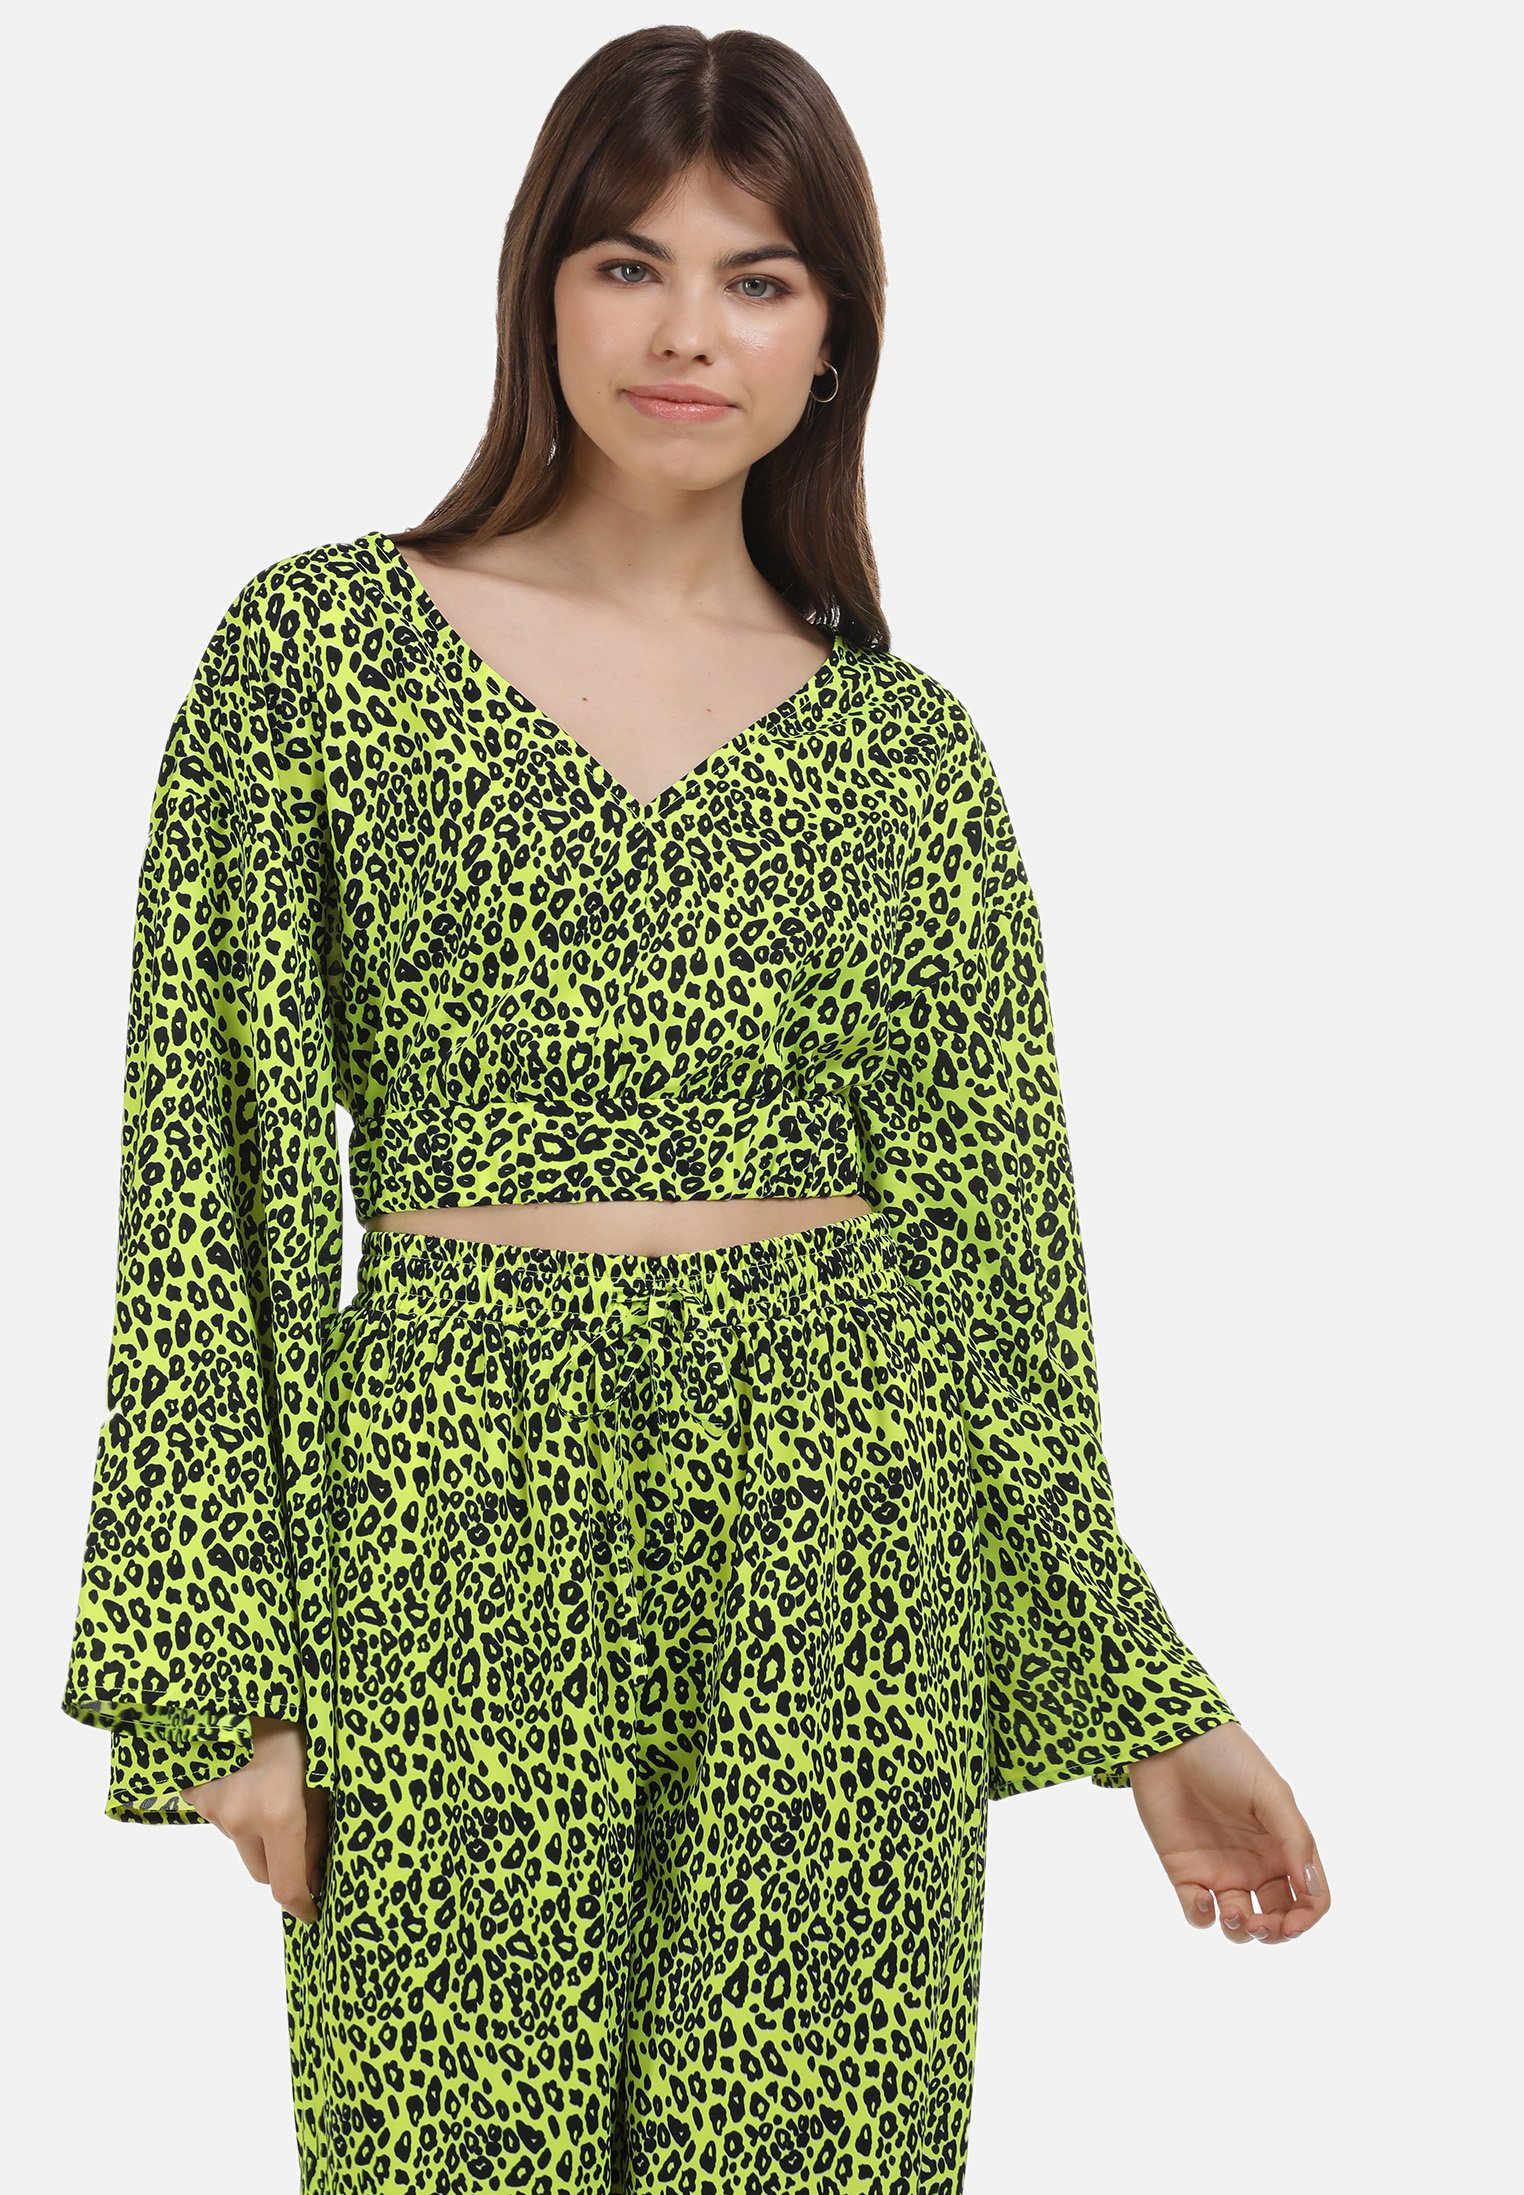 New And Fashion Women's Clothing myMo Blouse neon grün leo UTJTk6ru5